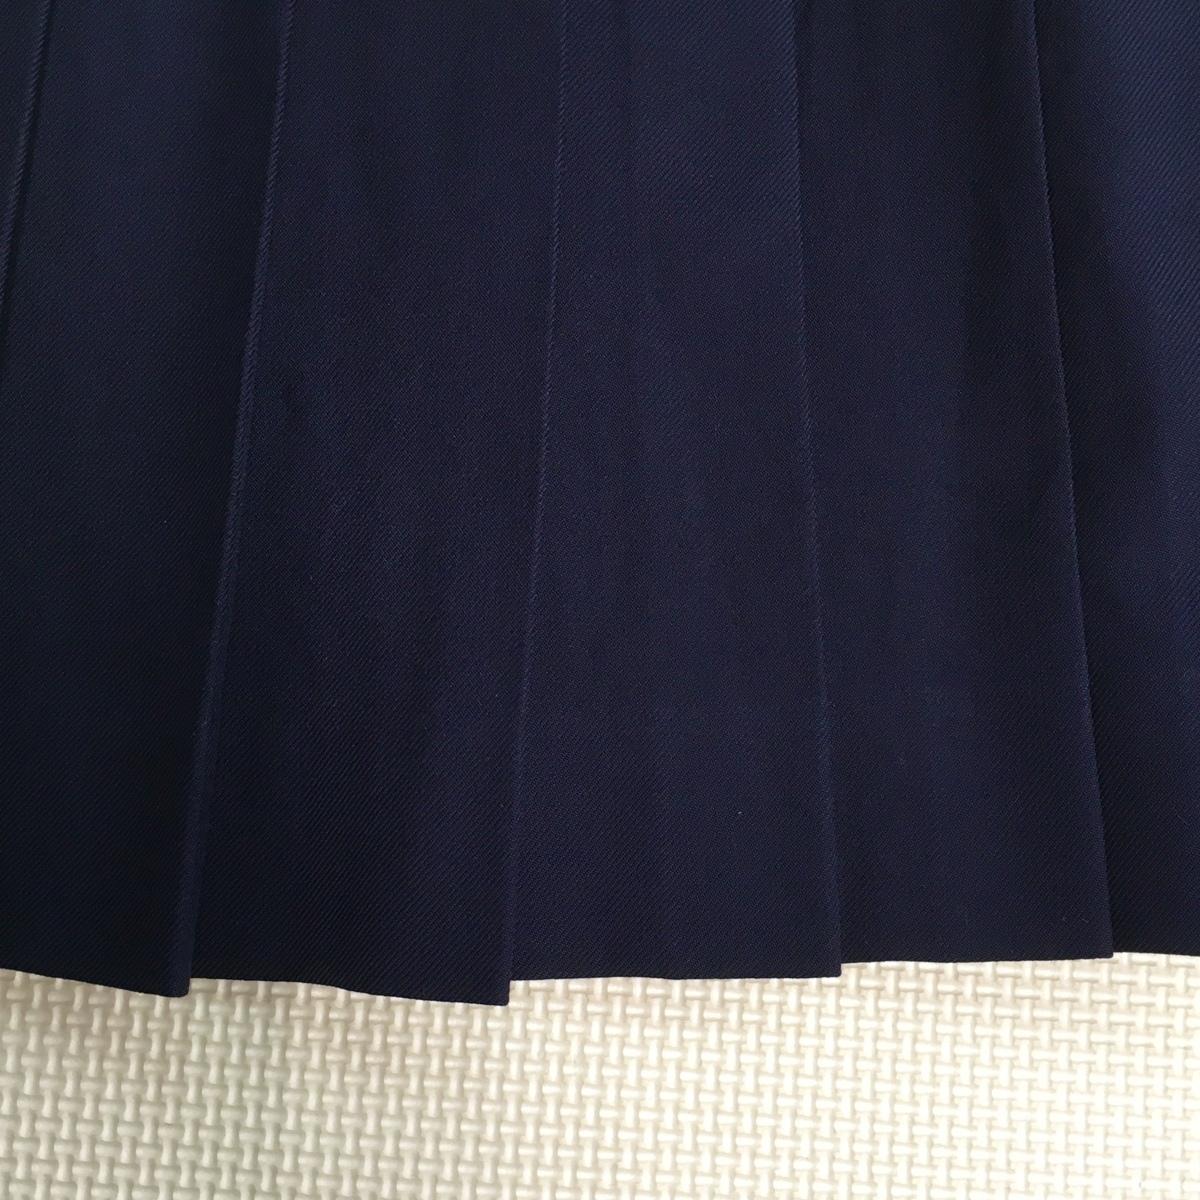 A610 (中古) スカート ブラウス 2点セット /LL/W75/大きいサイズ/スカート/ブラウス/紺/冬服/長袖/制服/中学校/高校/女子学生/学生服/学生_画像6